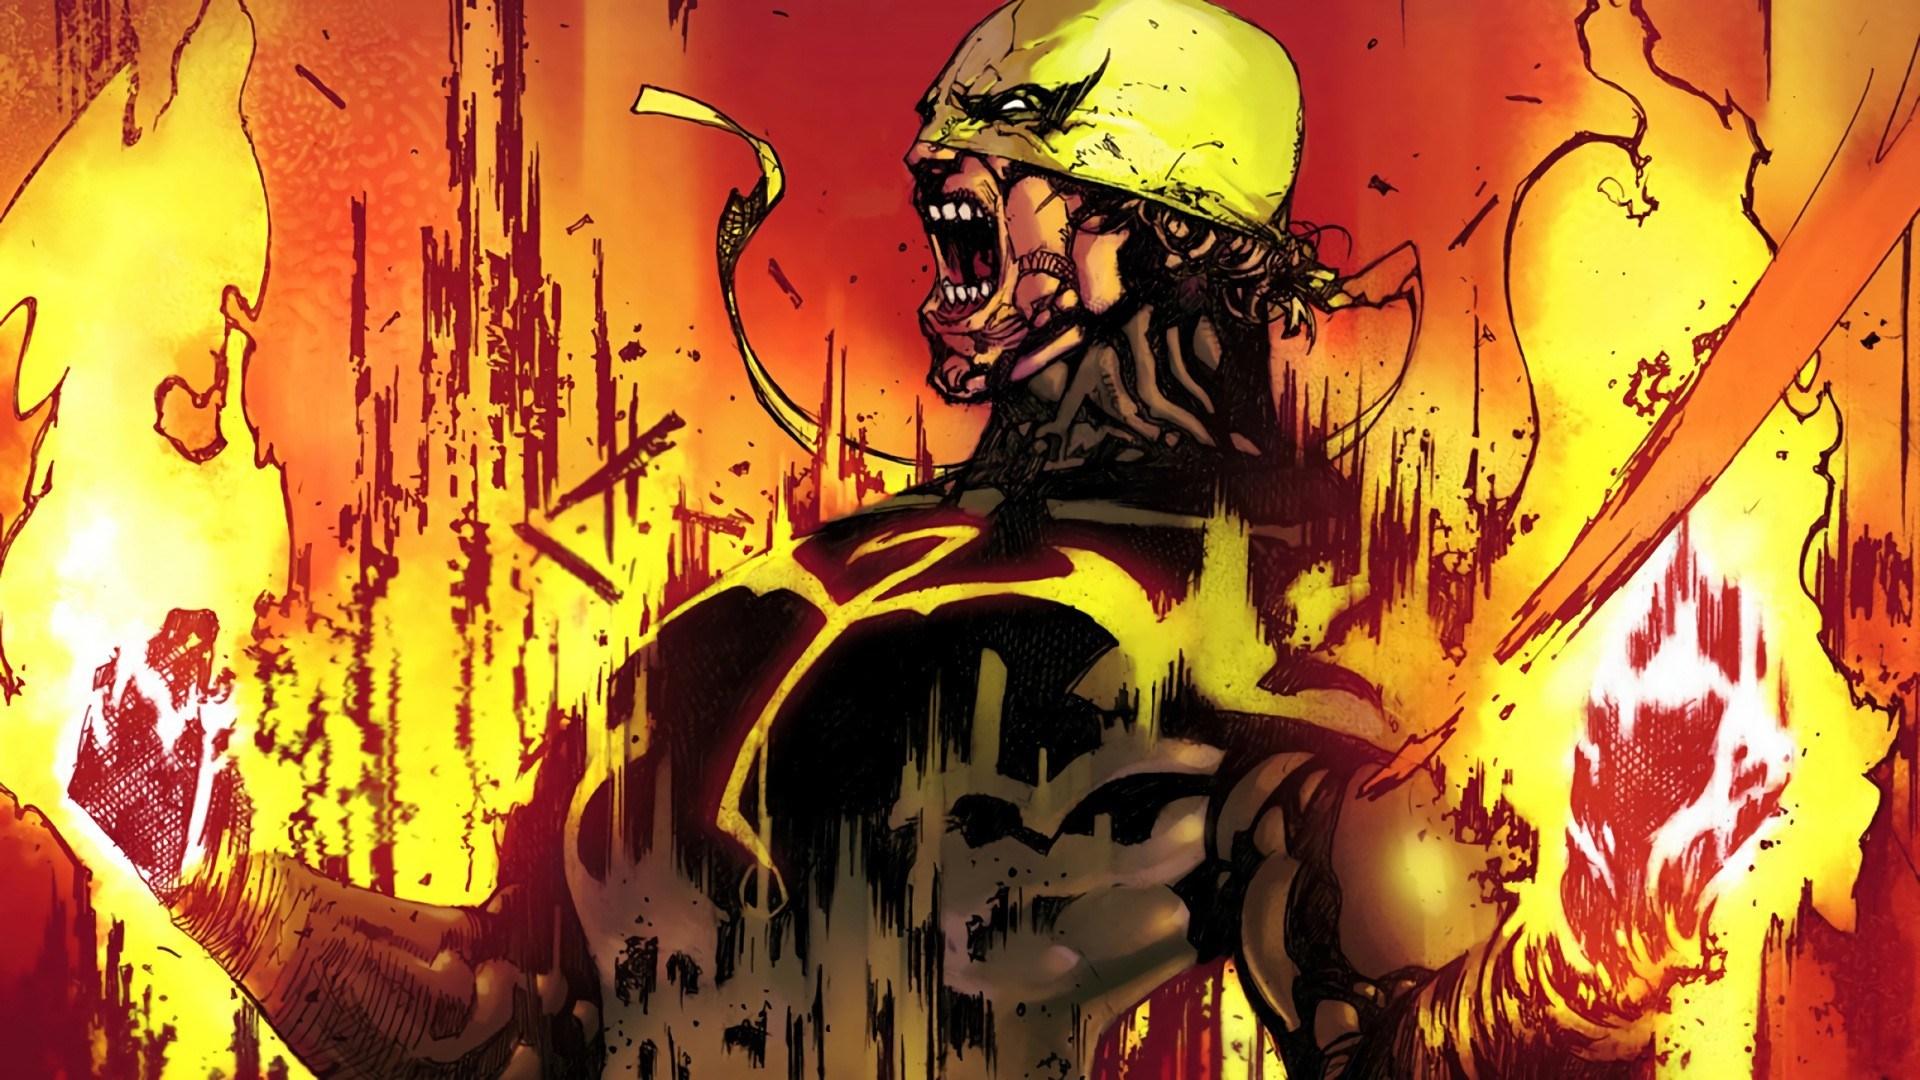 Batman vs Iron Fist